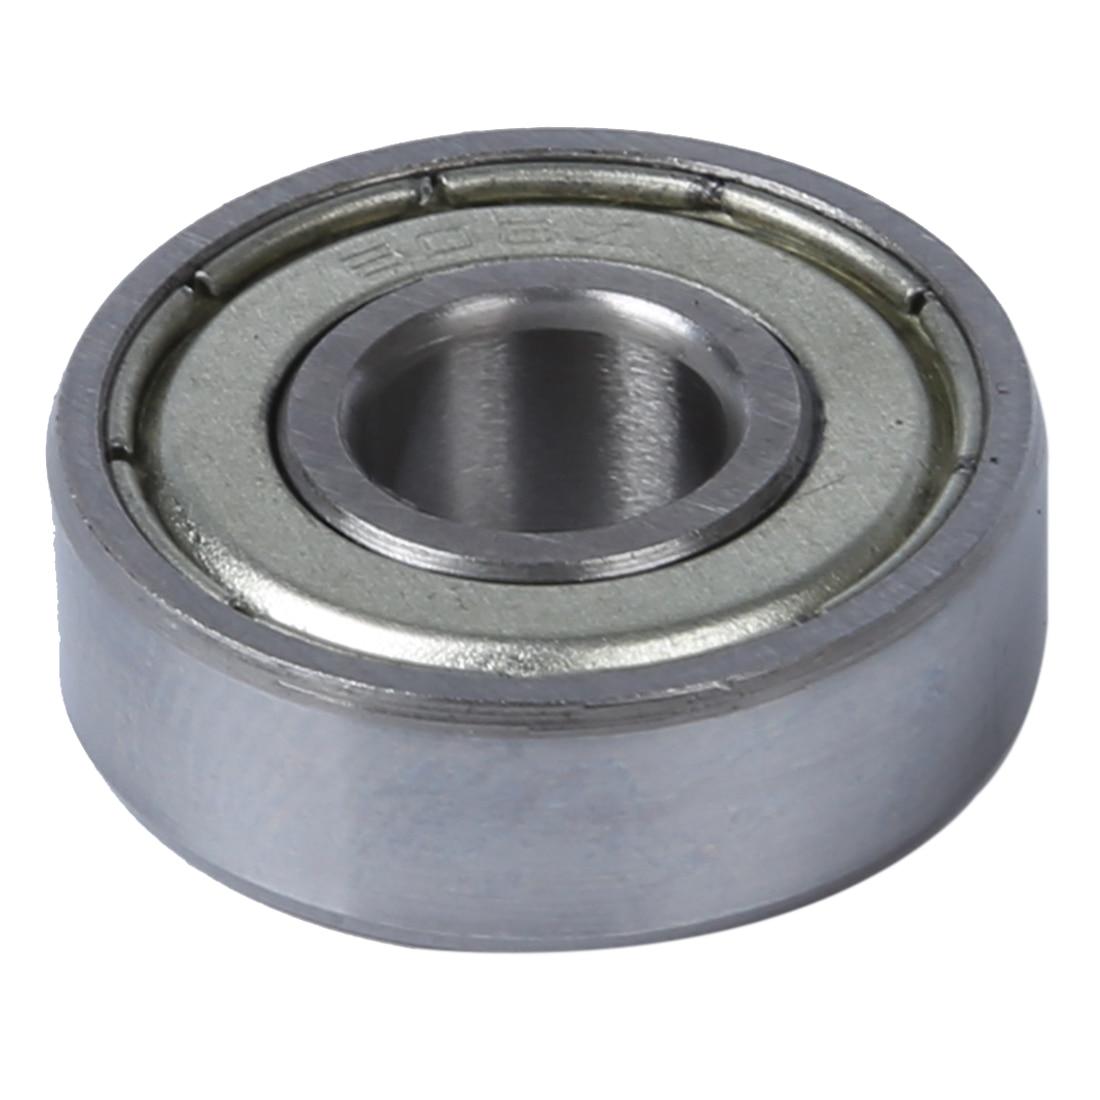 CNIM Hot 2 Pcs Single Shielded 608Z Miniature Deep Groove Ball Bearings 1pcs double shielded miniature deep groove ball bearings mr137zz 7 13 4 mm